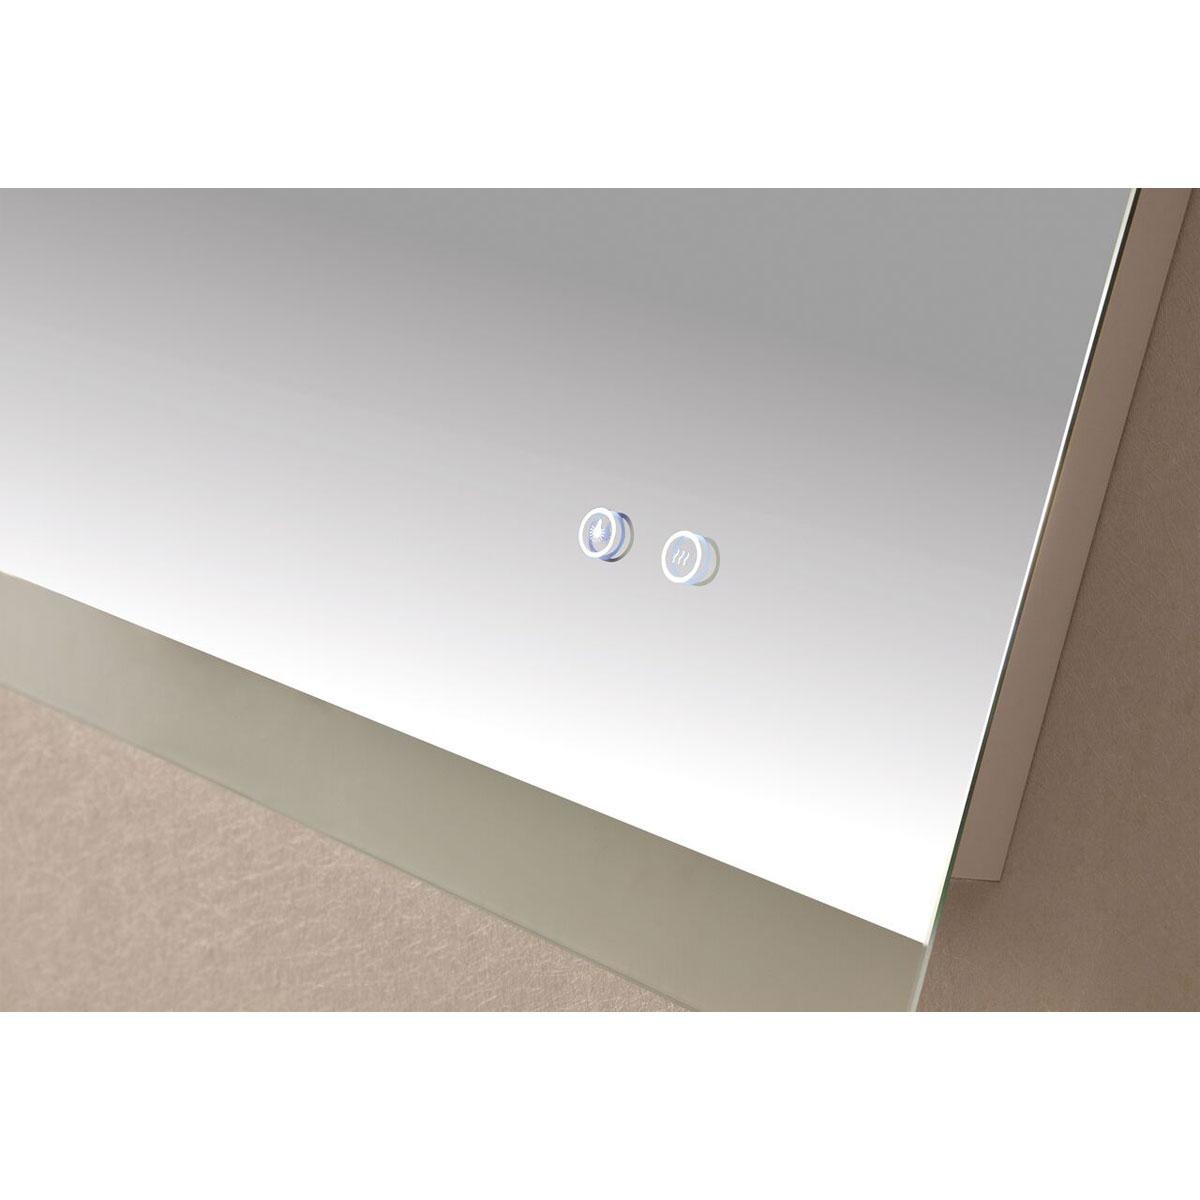 Otto 1200 Backlit Bathroom Mirror range - Demister, Magnifier, Clock